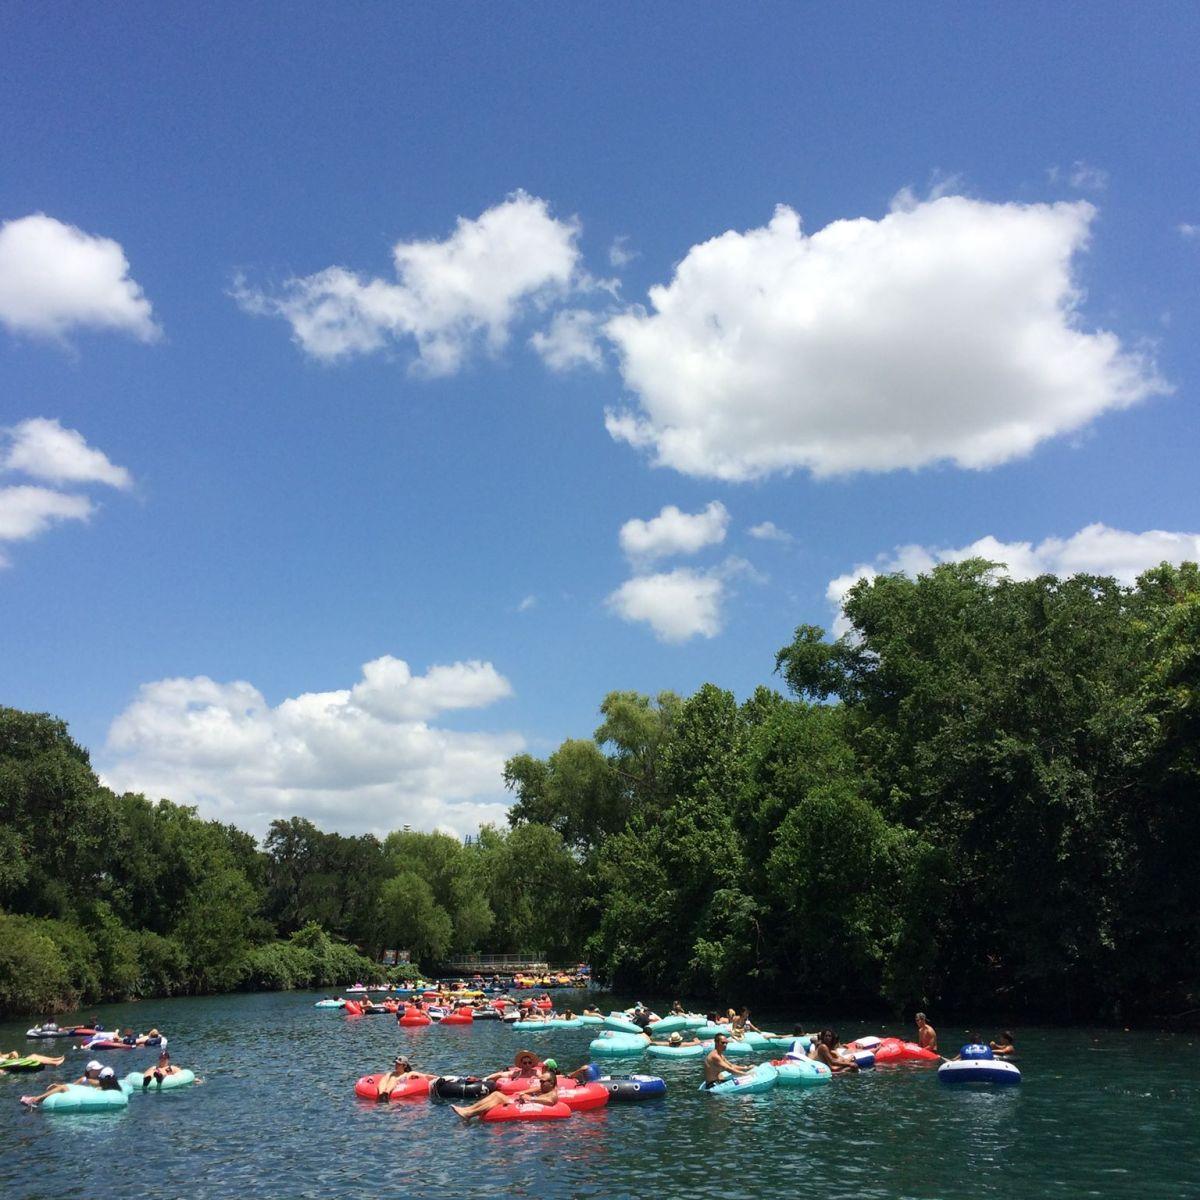 best texas getaways for summer, new braunfels tubing